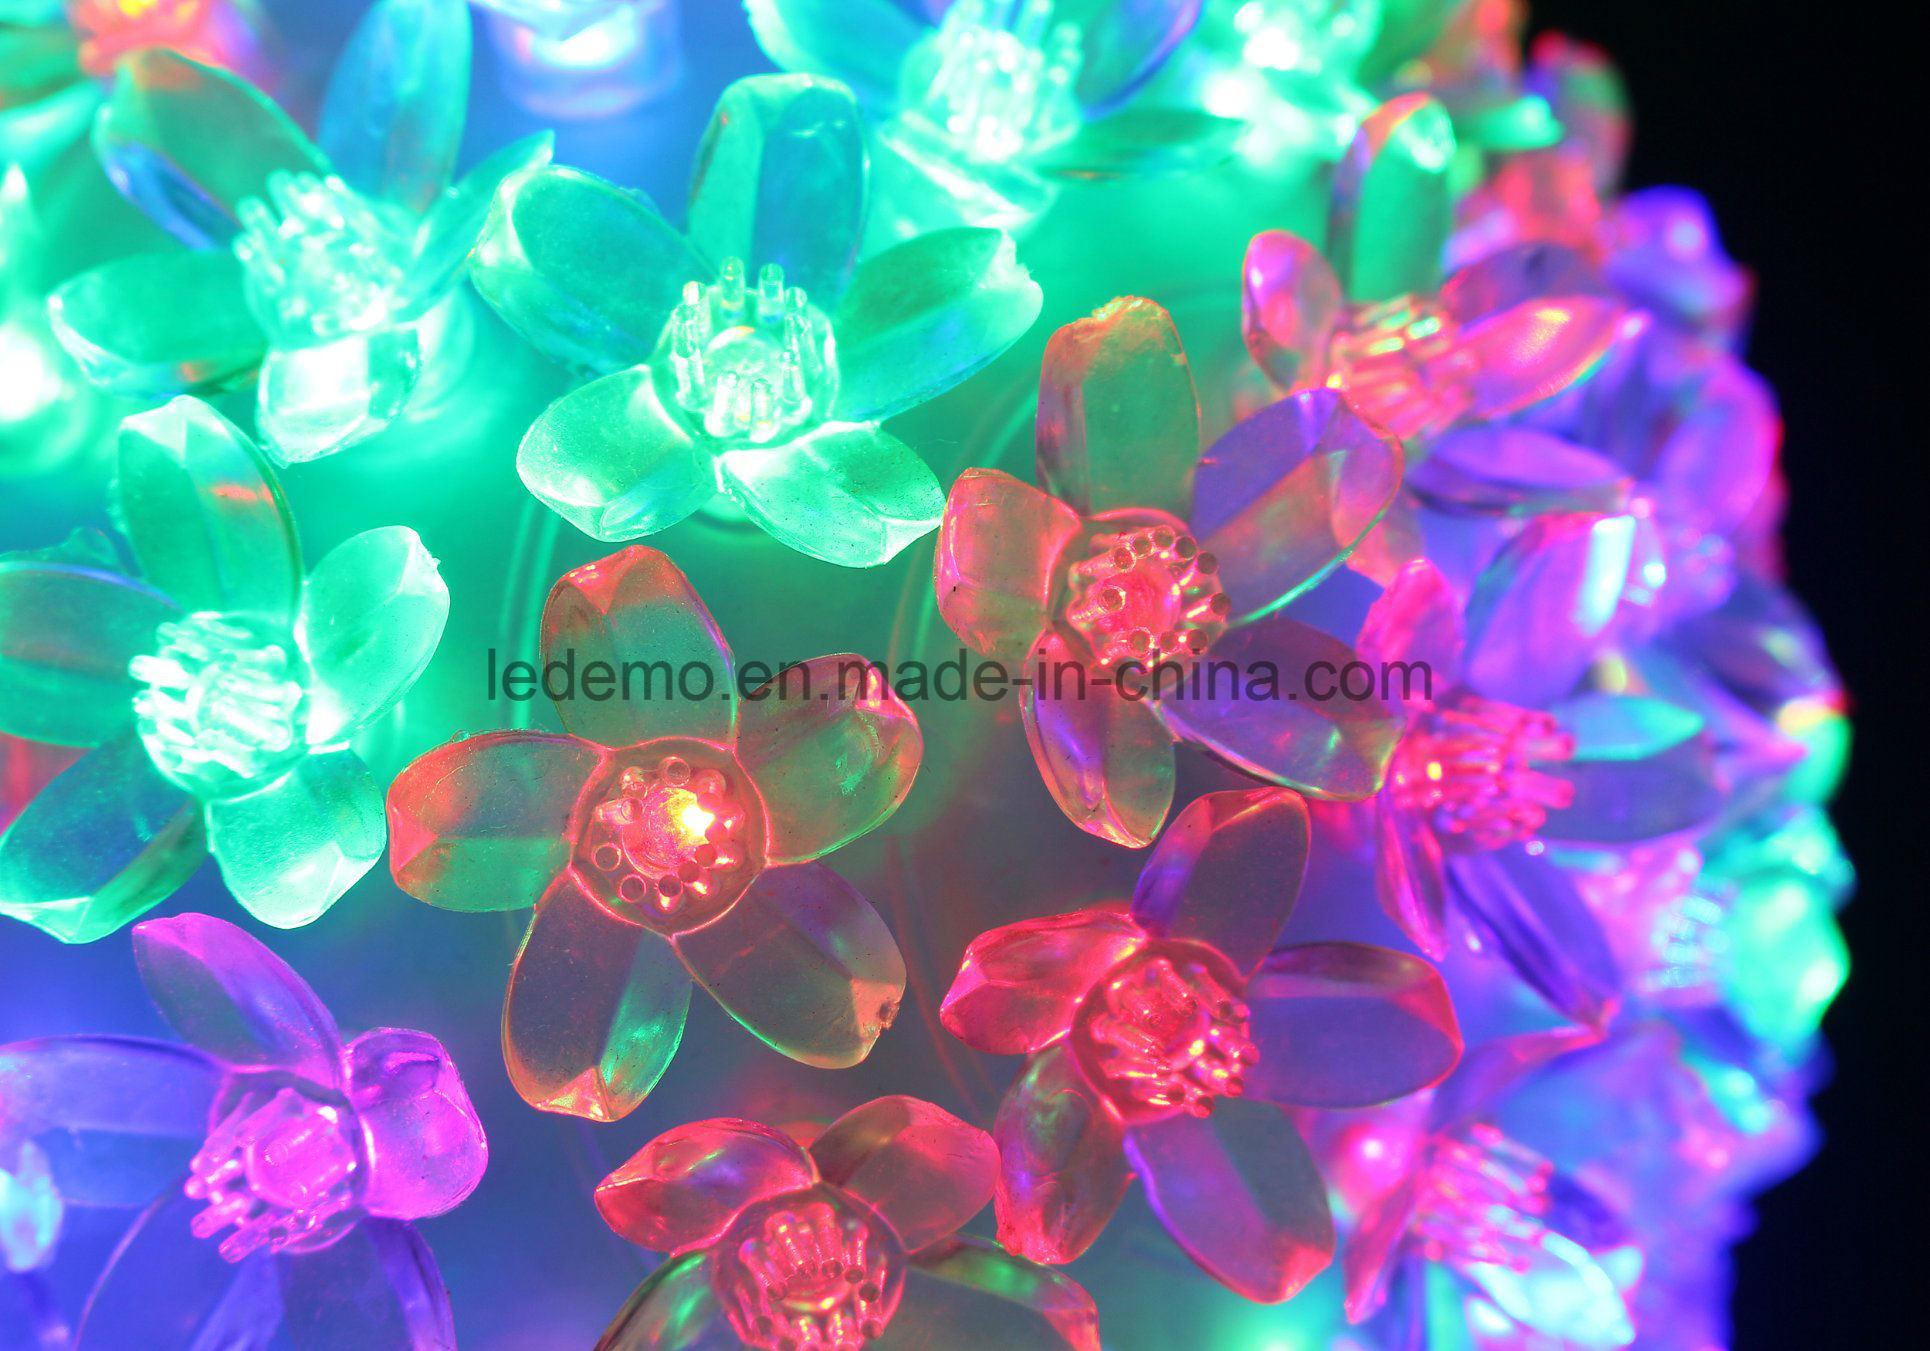 LED Decoration Multicolor Flower Ball Light